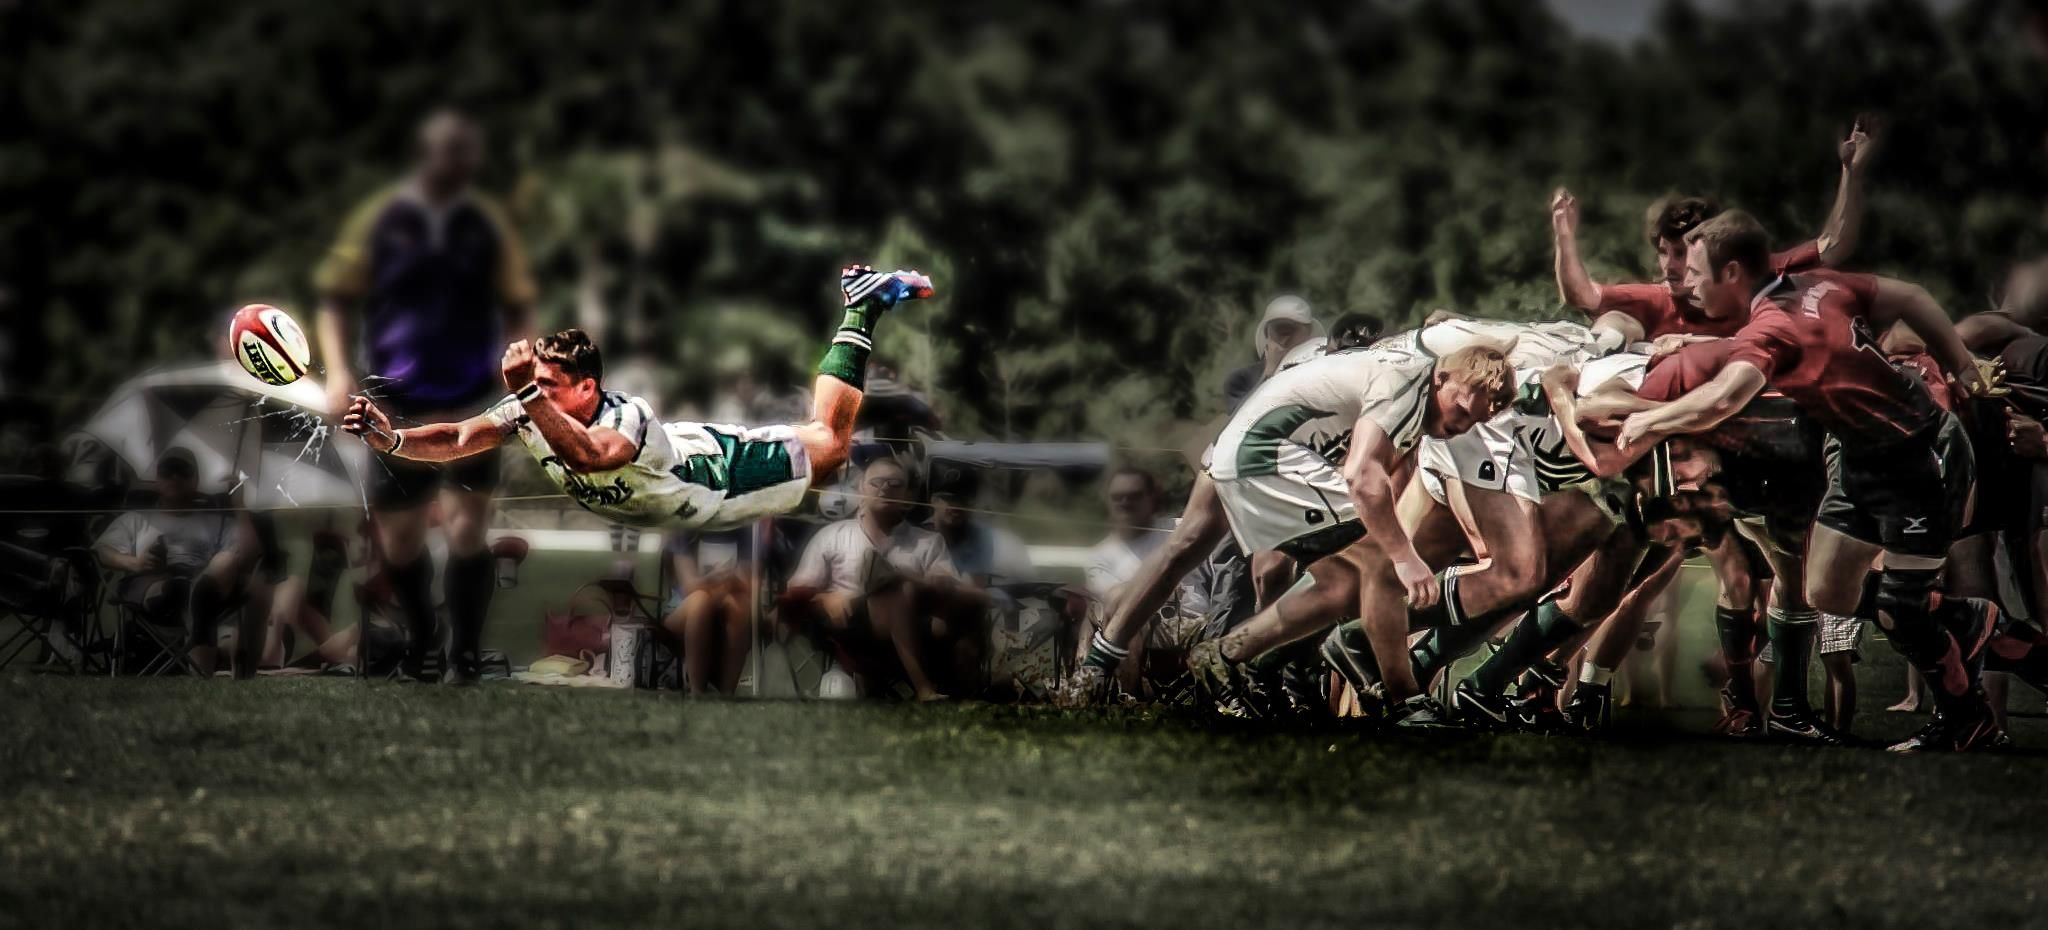 Hammerheads at 2013 South Championships - photo credit Jennifer Castano.